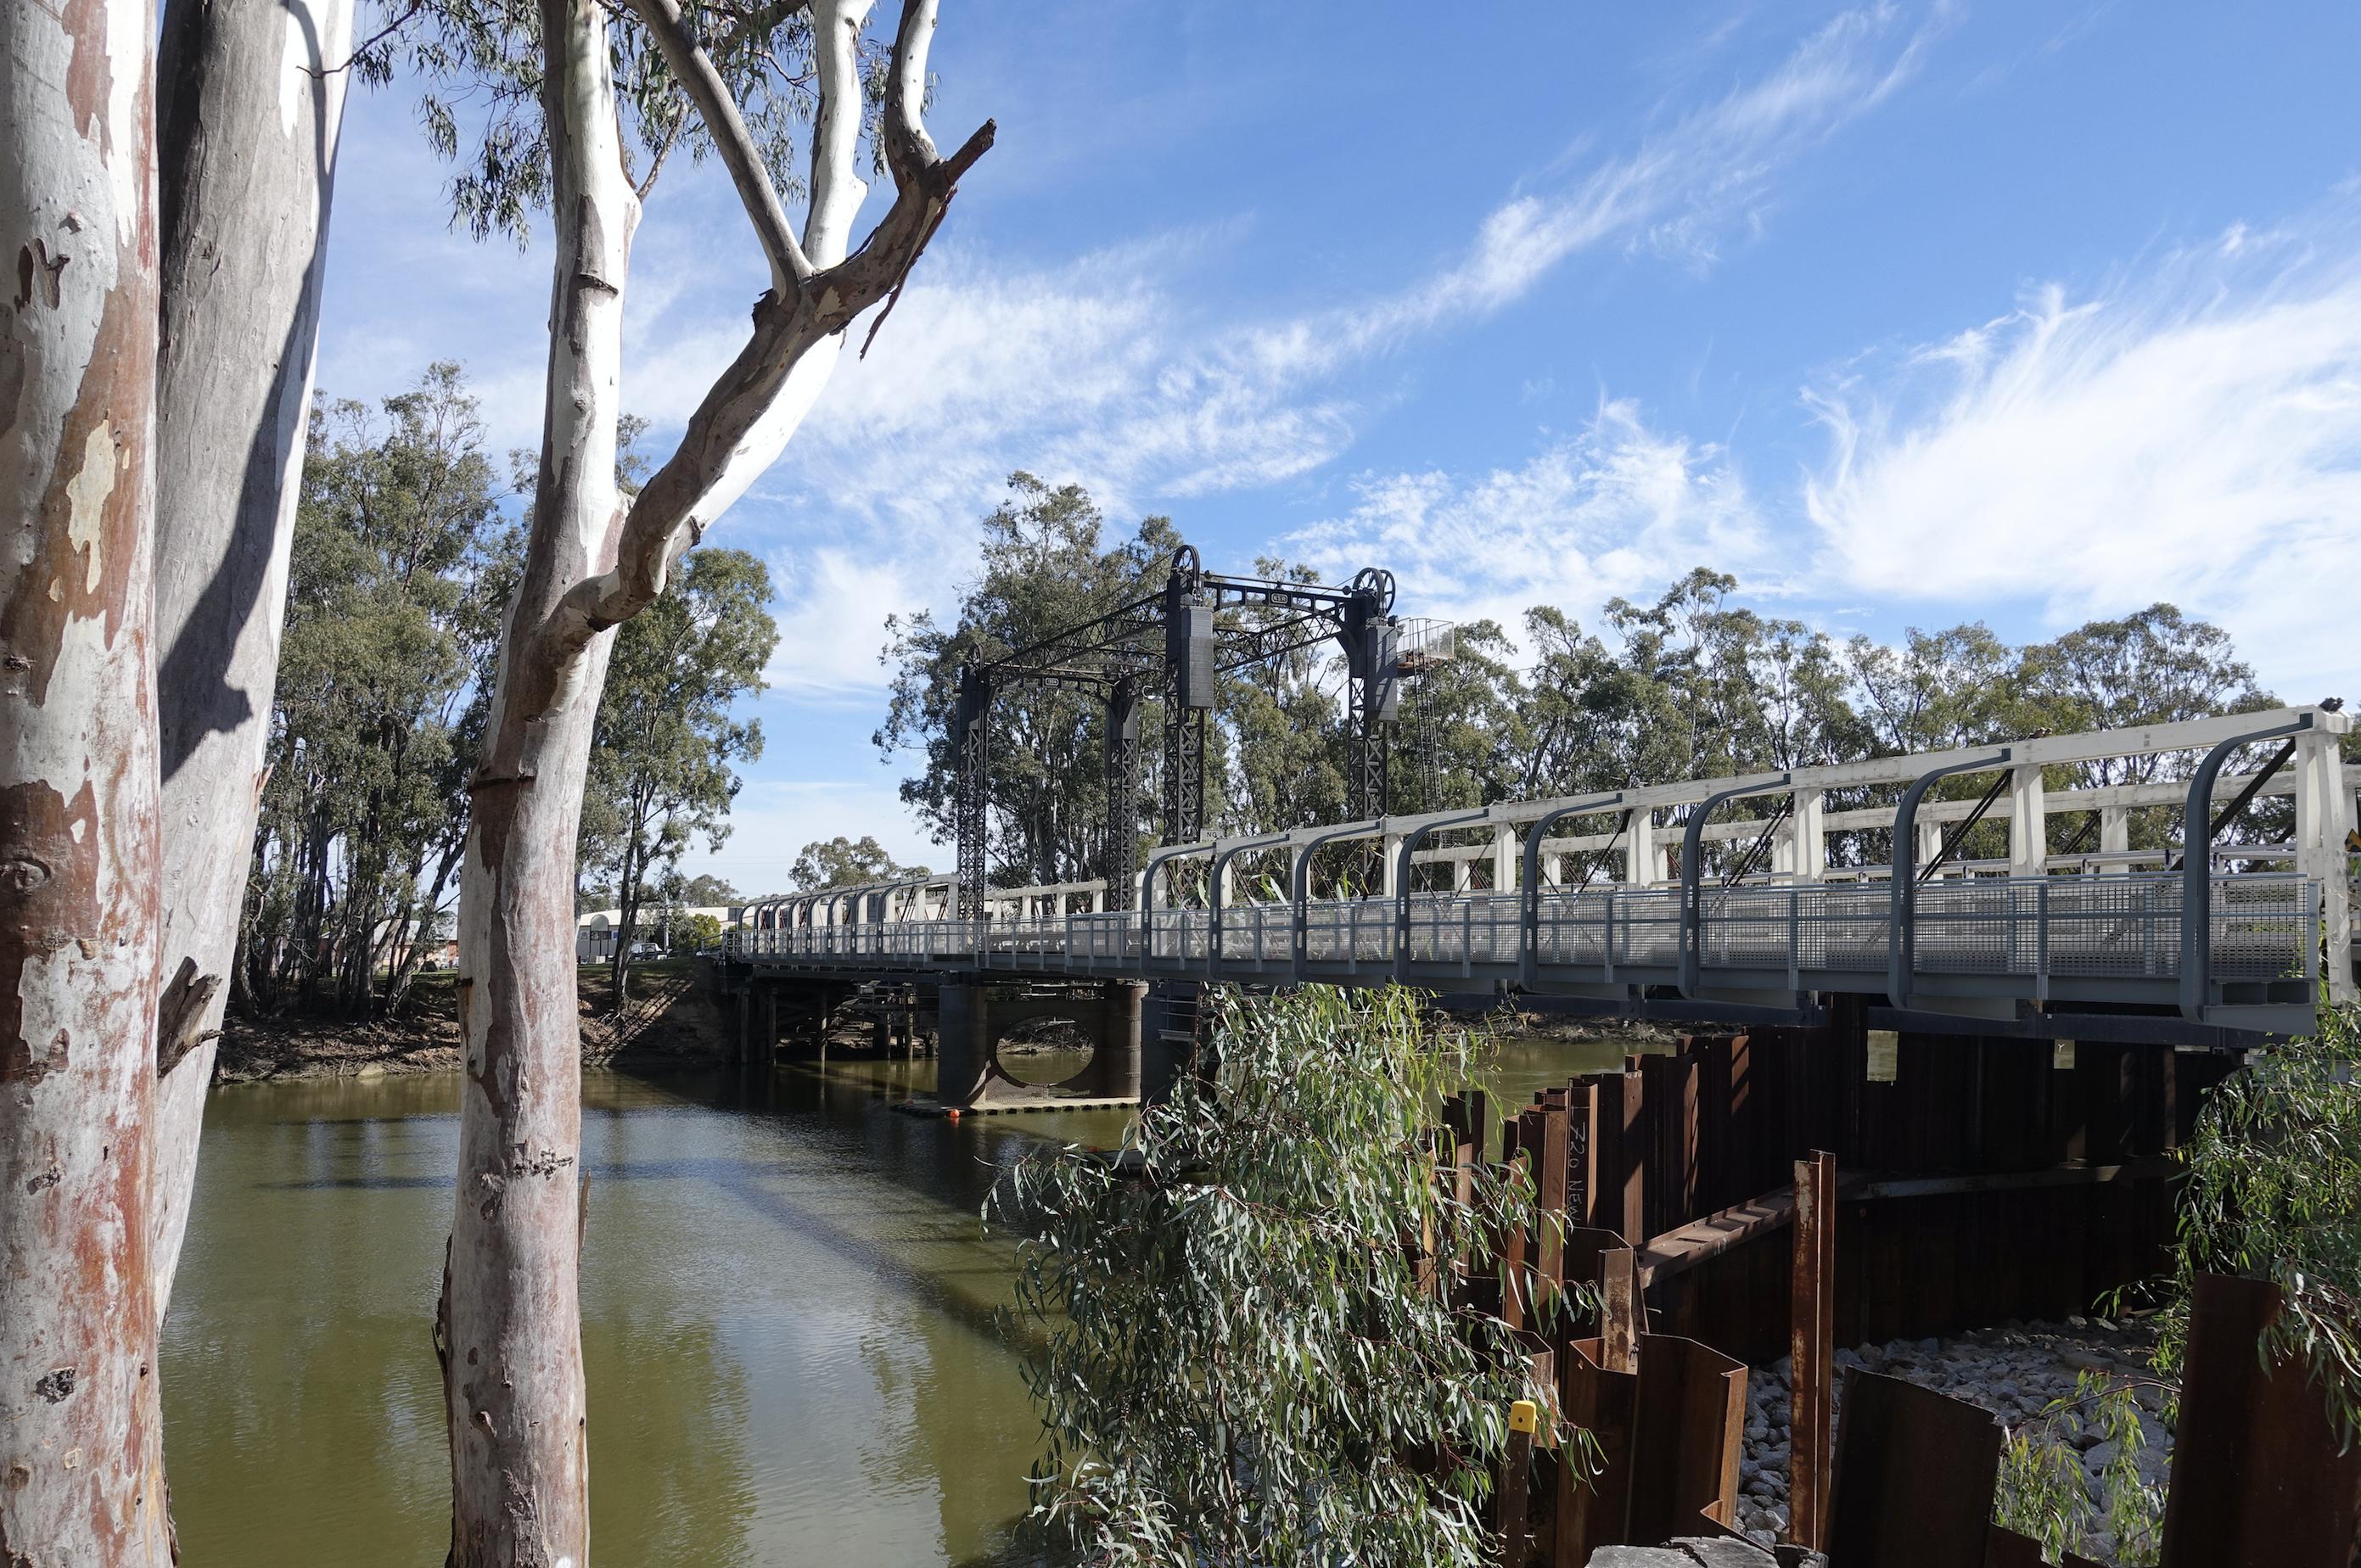 Barham-bridge-kistudio-001